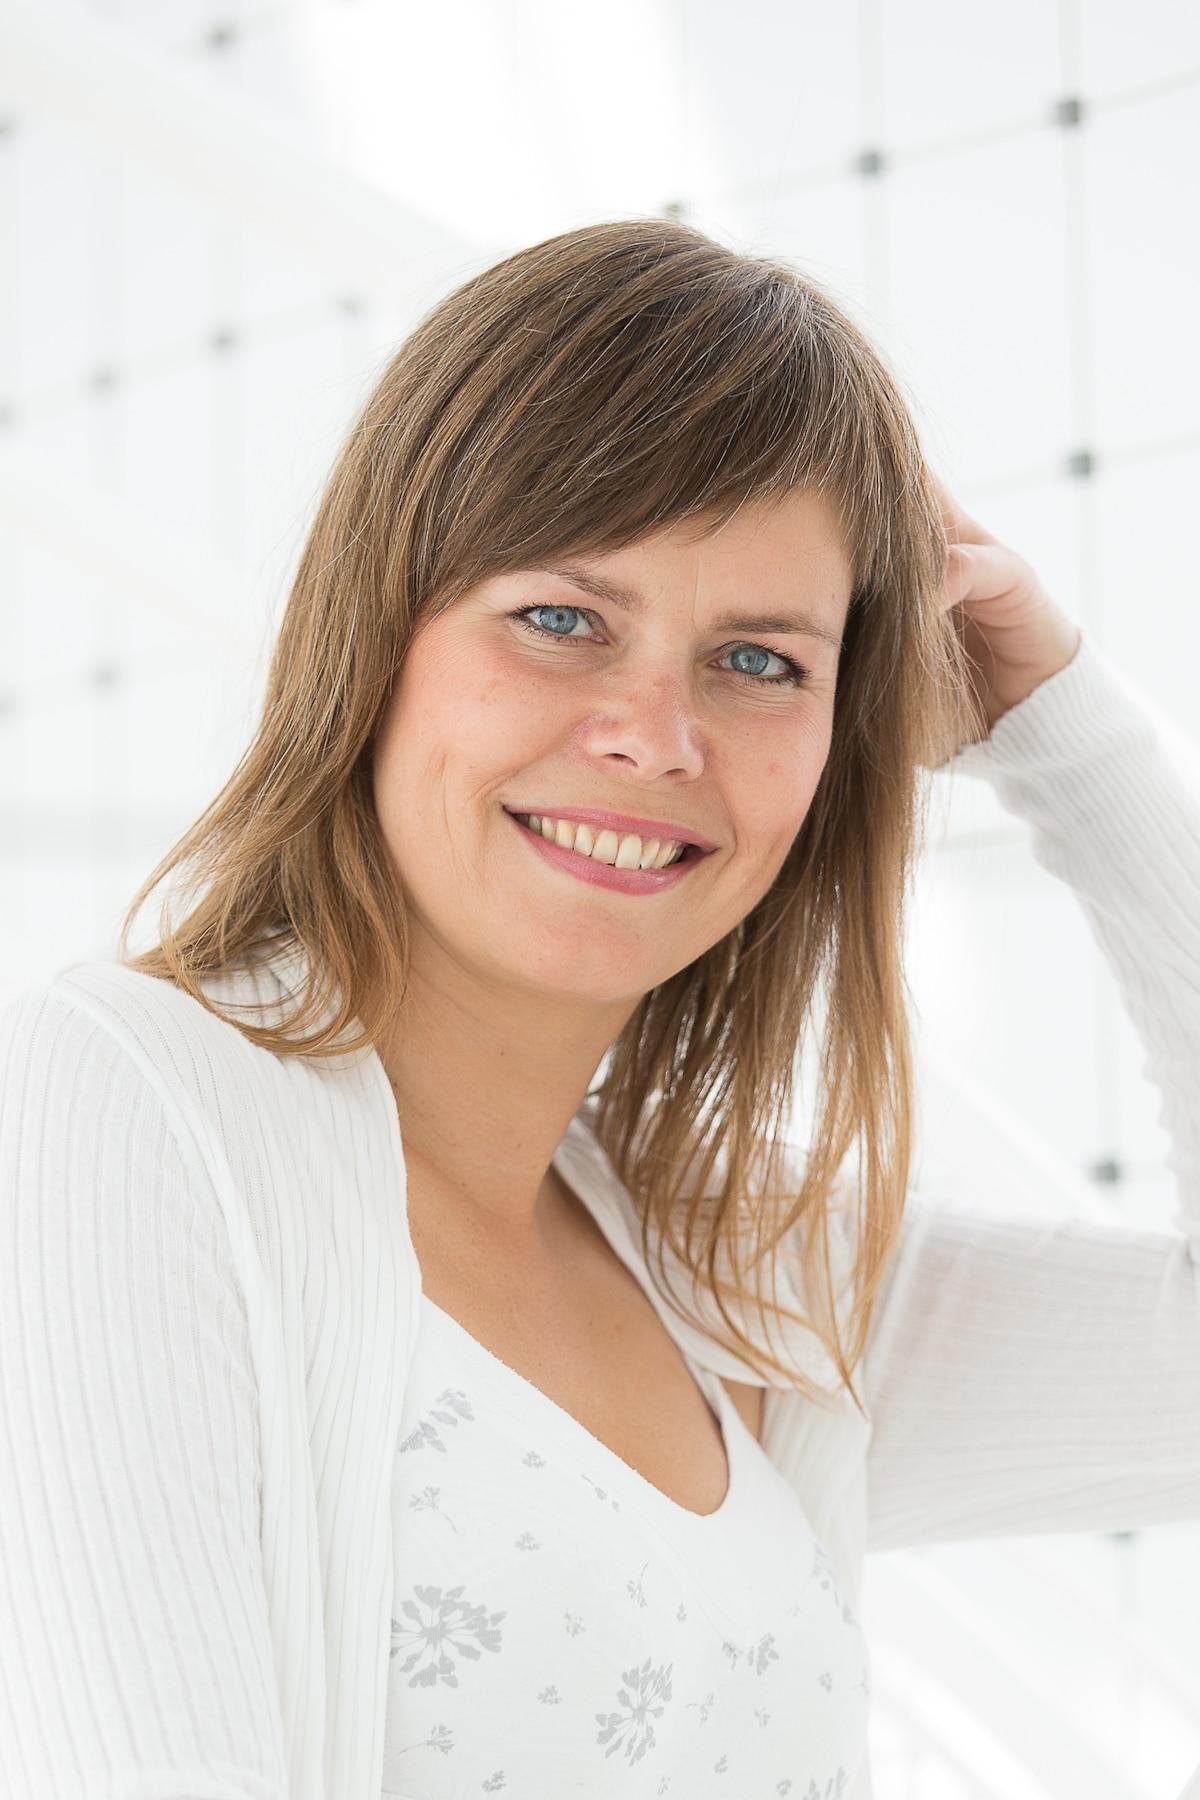 Nathalie from Rijswijk